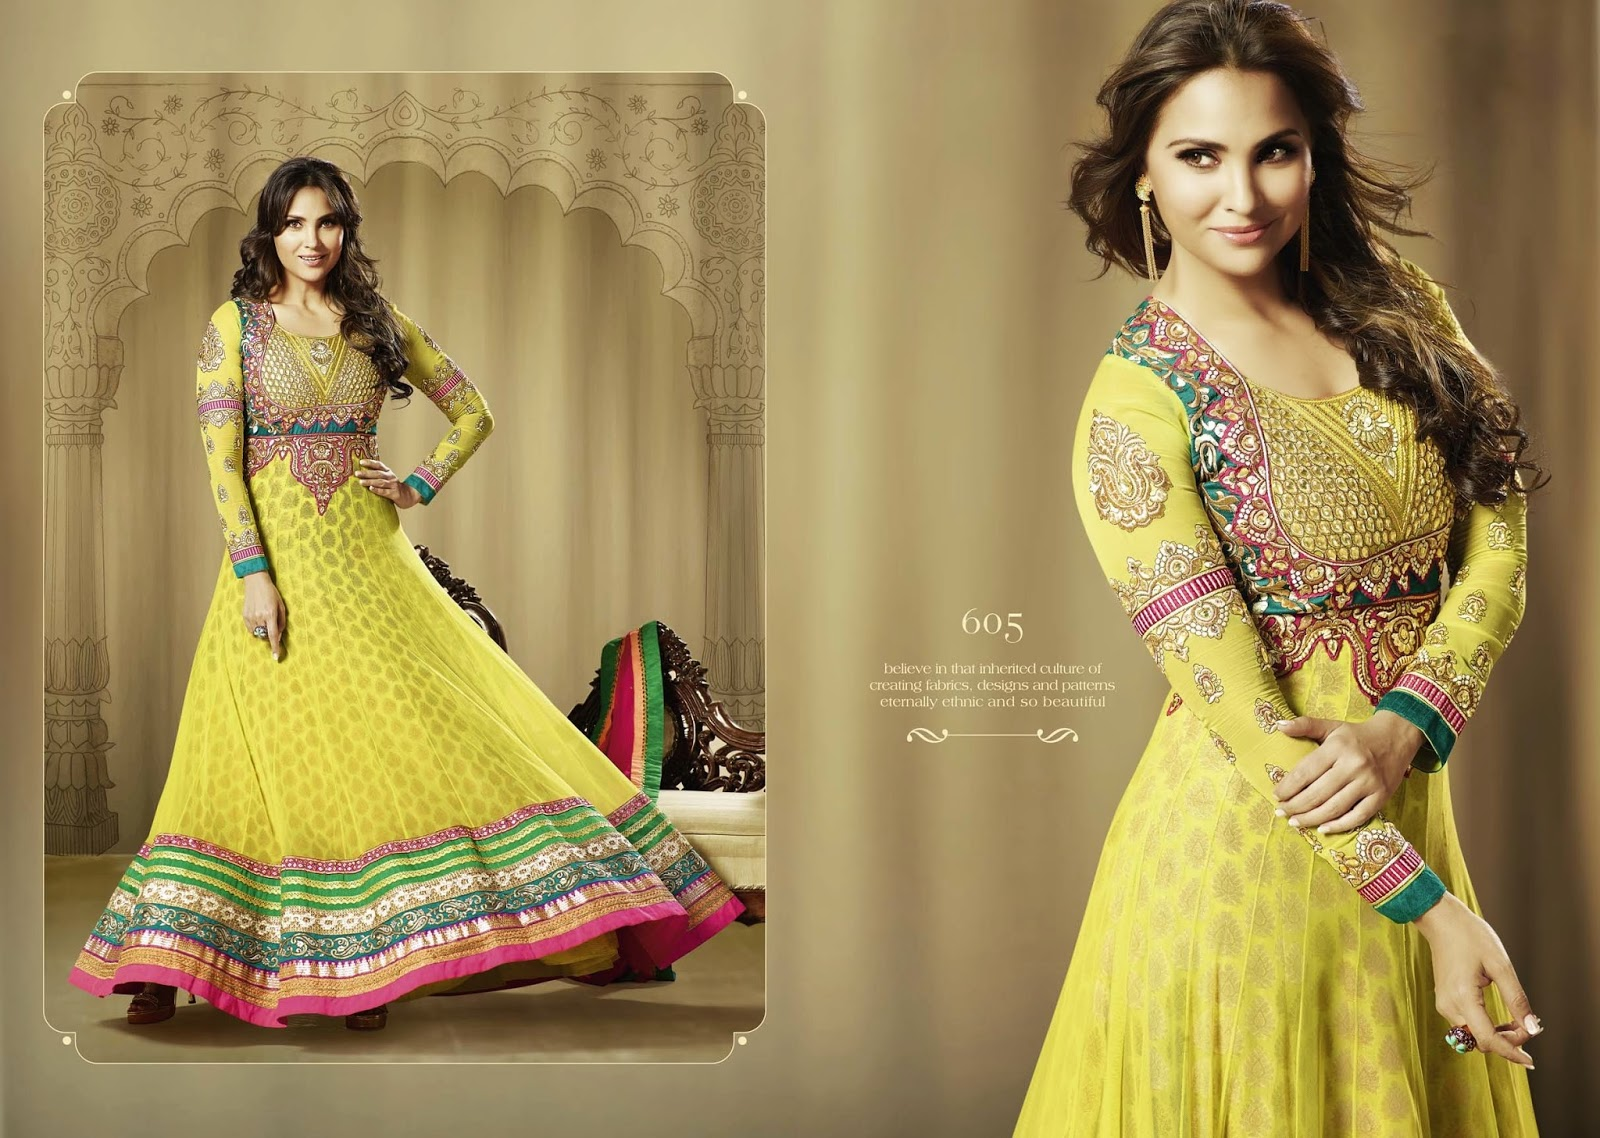 1f1258c653 Wholesaler Of Indian Ethnic Women Wear: Lara Dutta Stylish Embroidered Long Anarkali  Suit